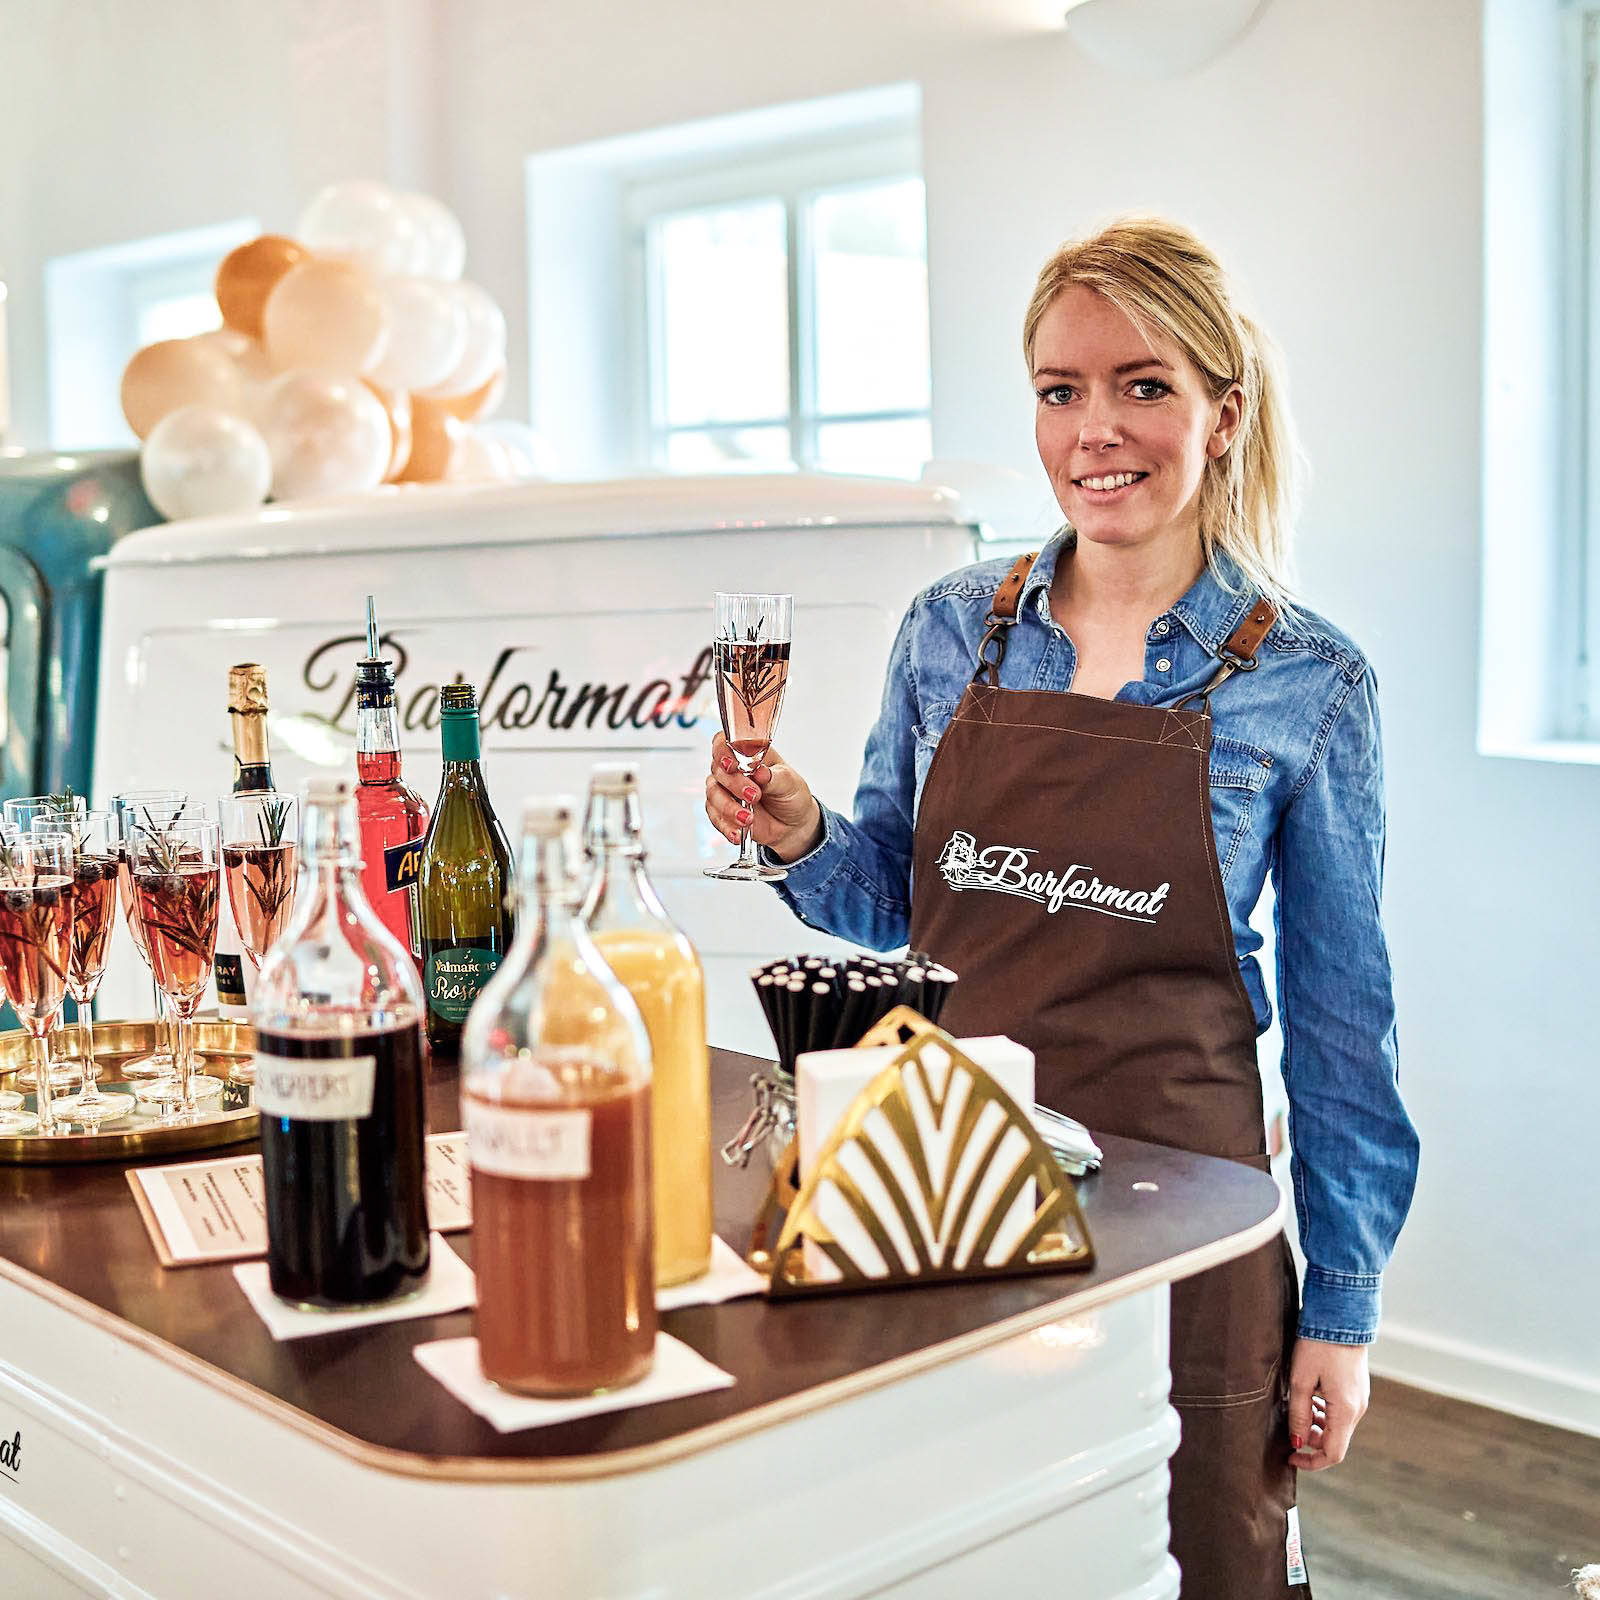 Mobile | Bar | Hannover | Ape | VW | Bulli | Cocktailservice | Getränke | Catering | Foodtruck | Sektempfang | Standesamt | Hochzeit | Barkeeper | Kellner | Hochzeit | Event | Mieten | Buchen | Hamburgfeiert